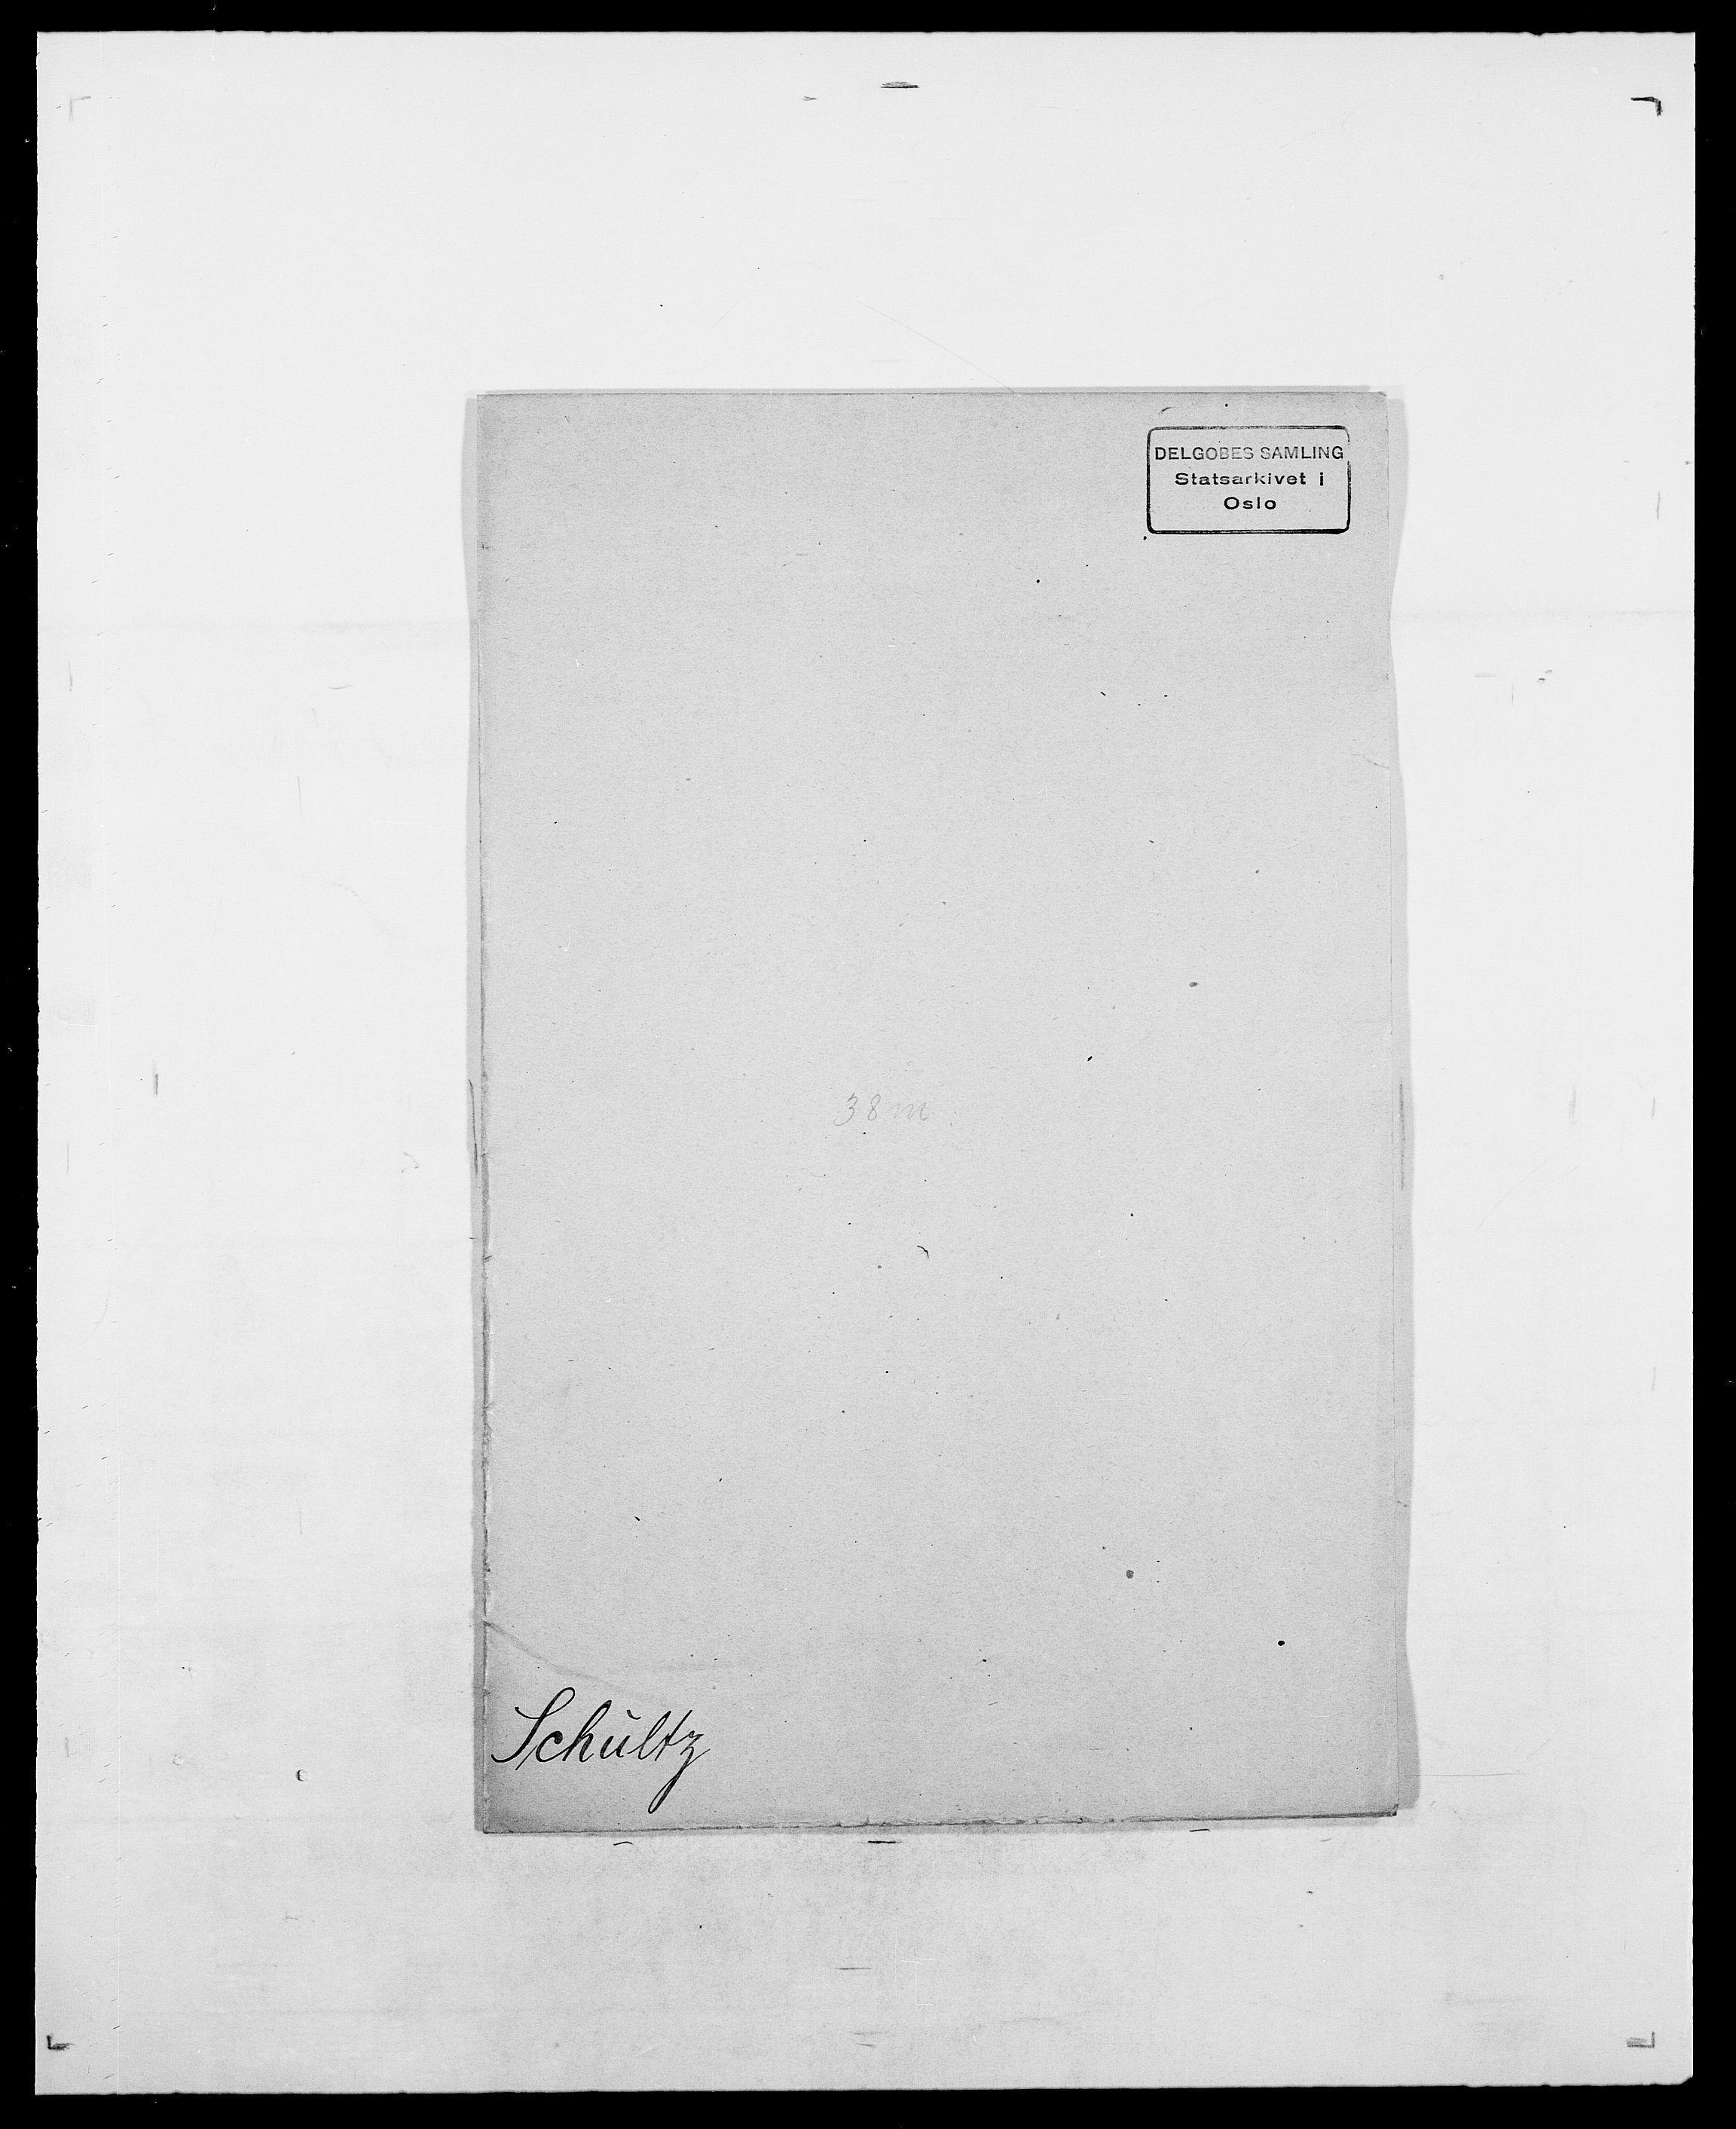 SAO, Delgobe, Charles Antoine - samling, D/Da/L0035: Schnabel - sjetman, s. 279